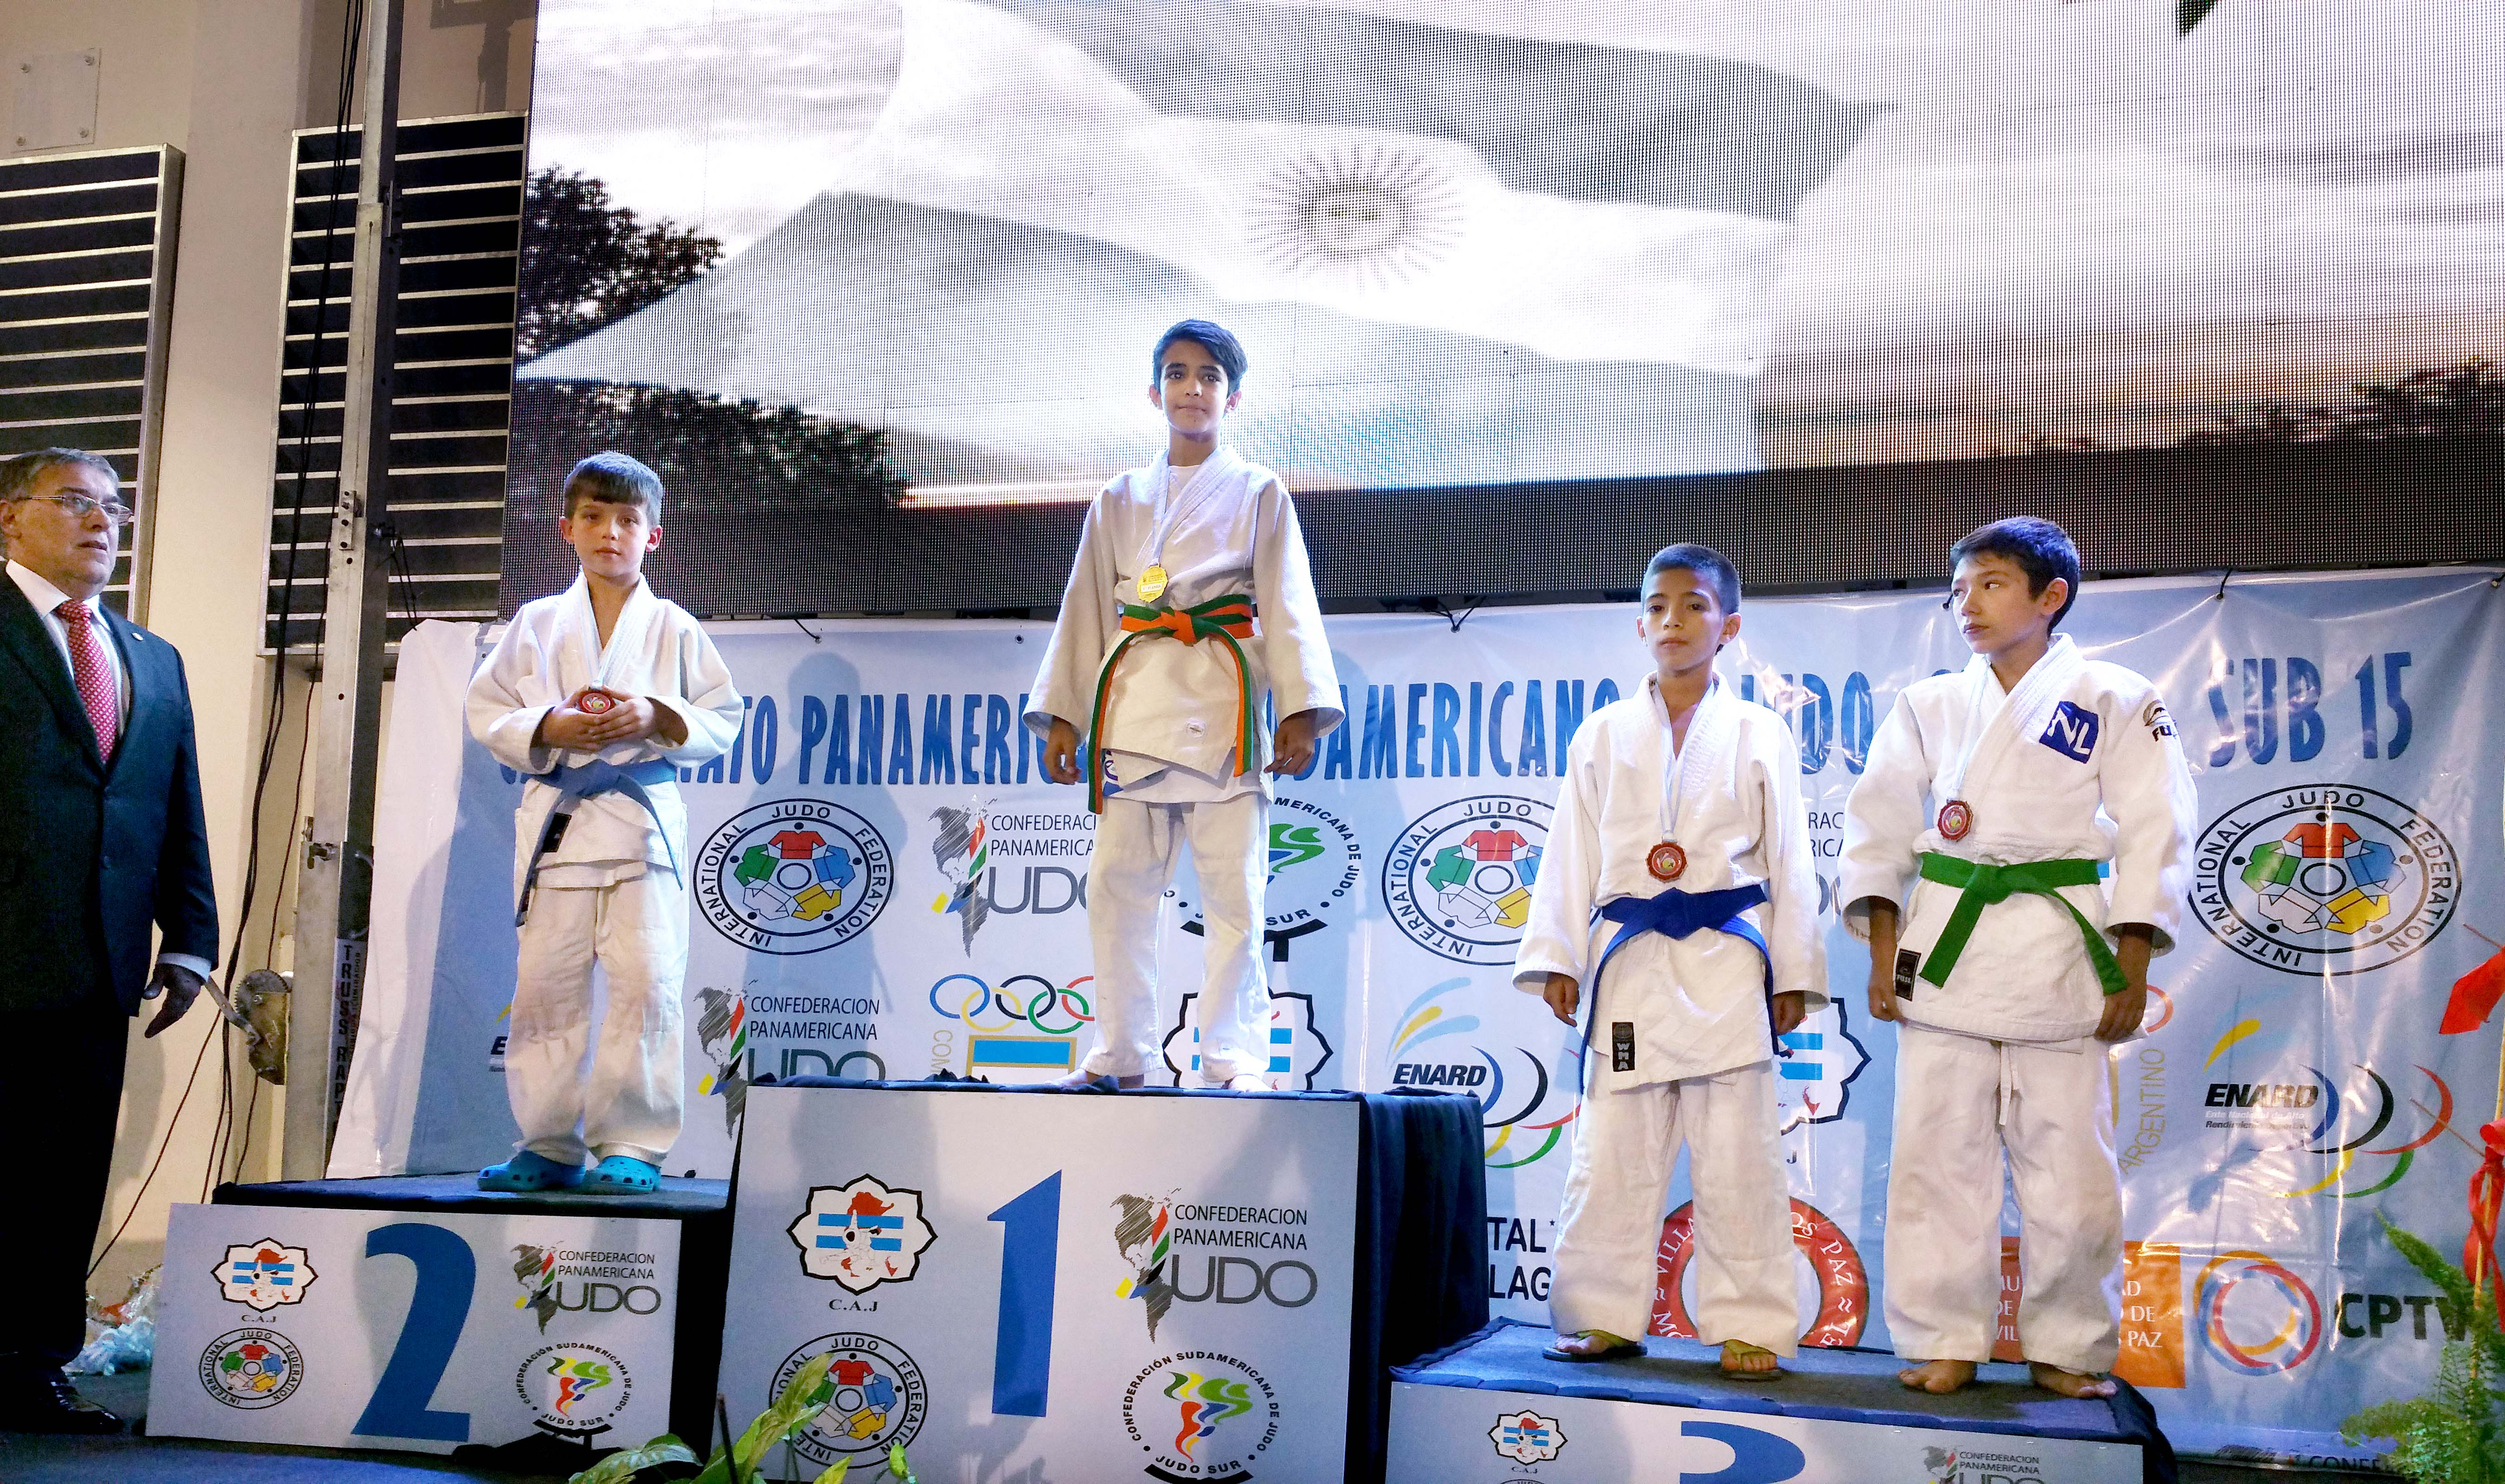 Warrick and Tamai Place at Junior Pan American Championships